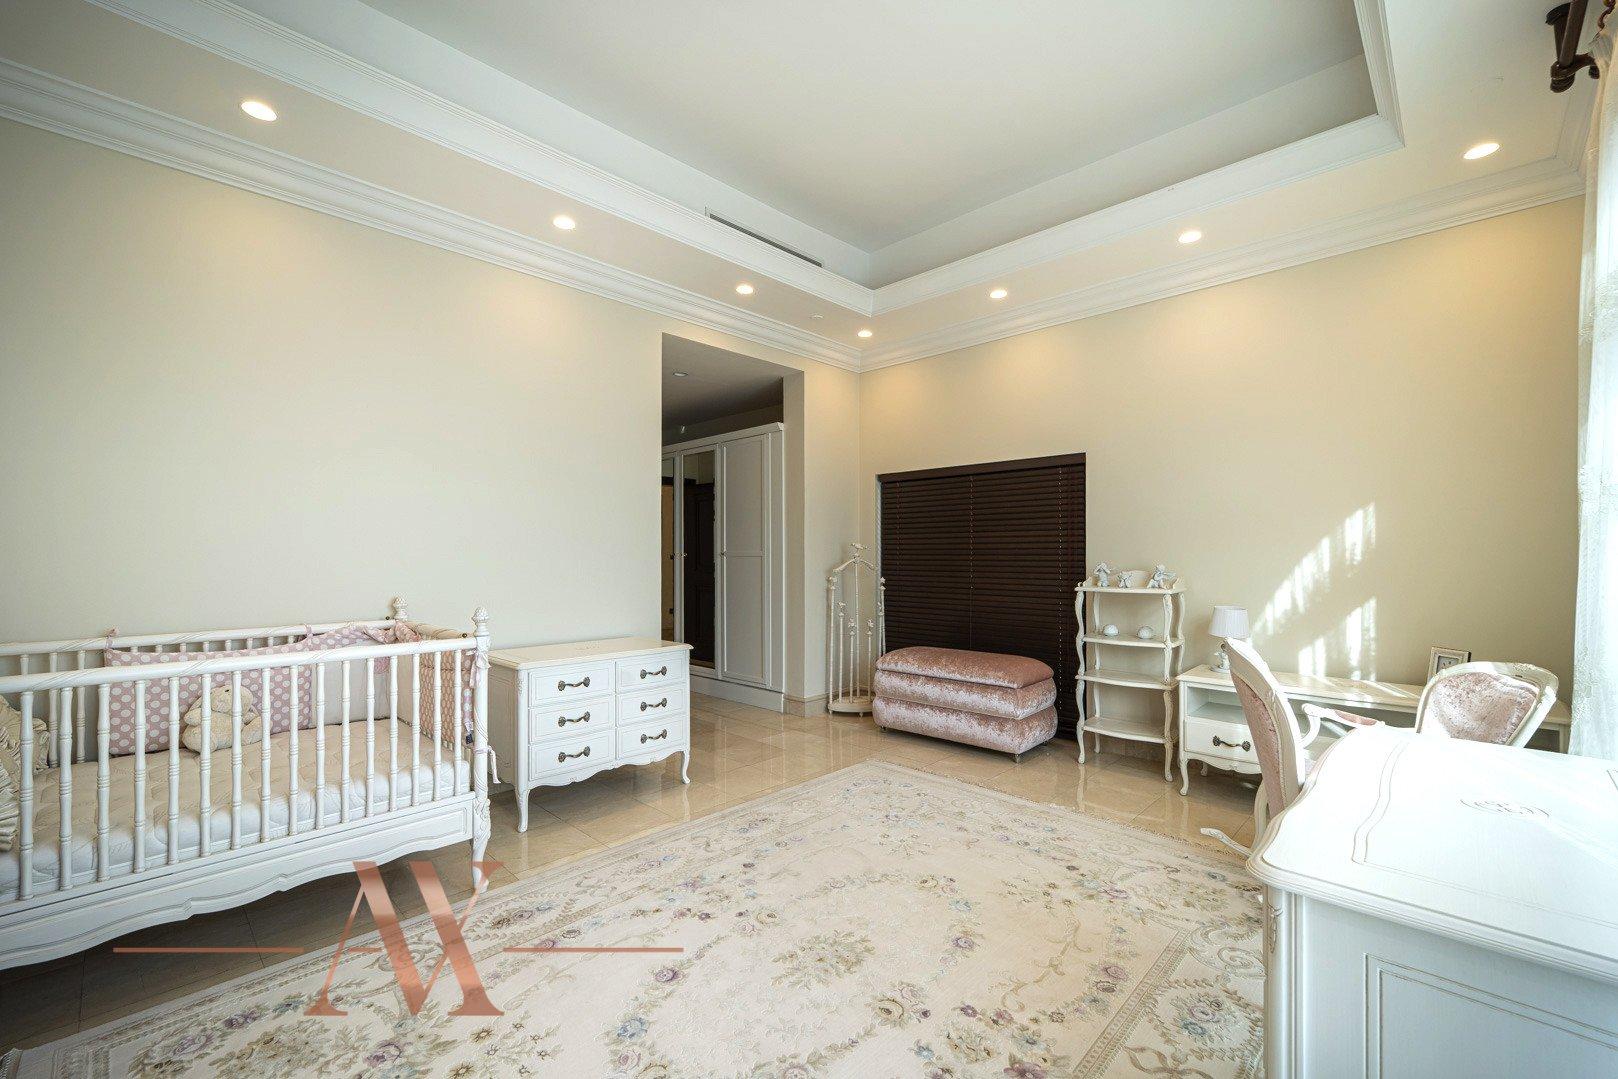 Penthouse for sale in Dubai, UAE, 5 bedrooms, 1057 m2, No. 23747 – photo 8